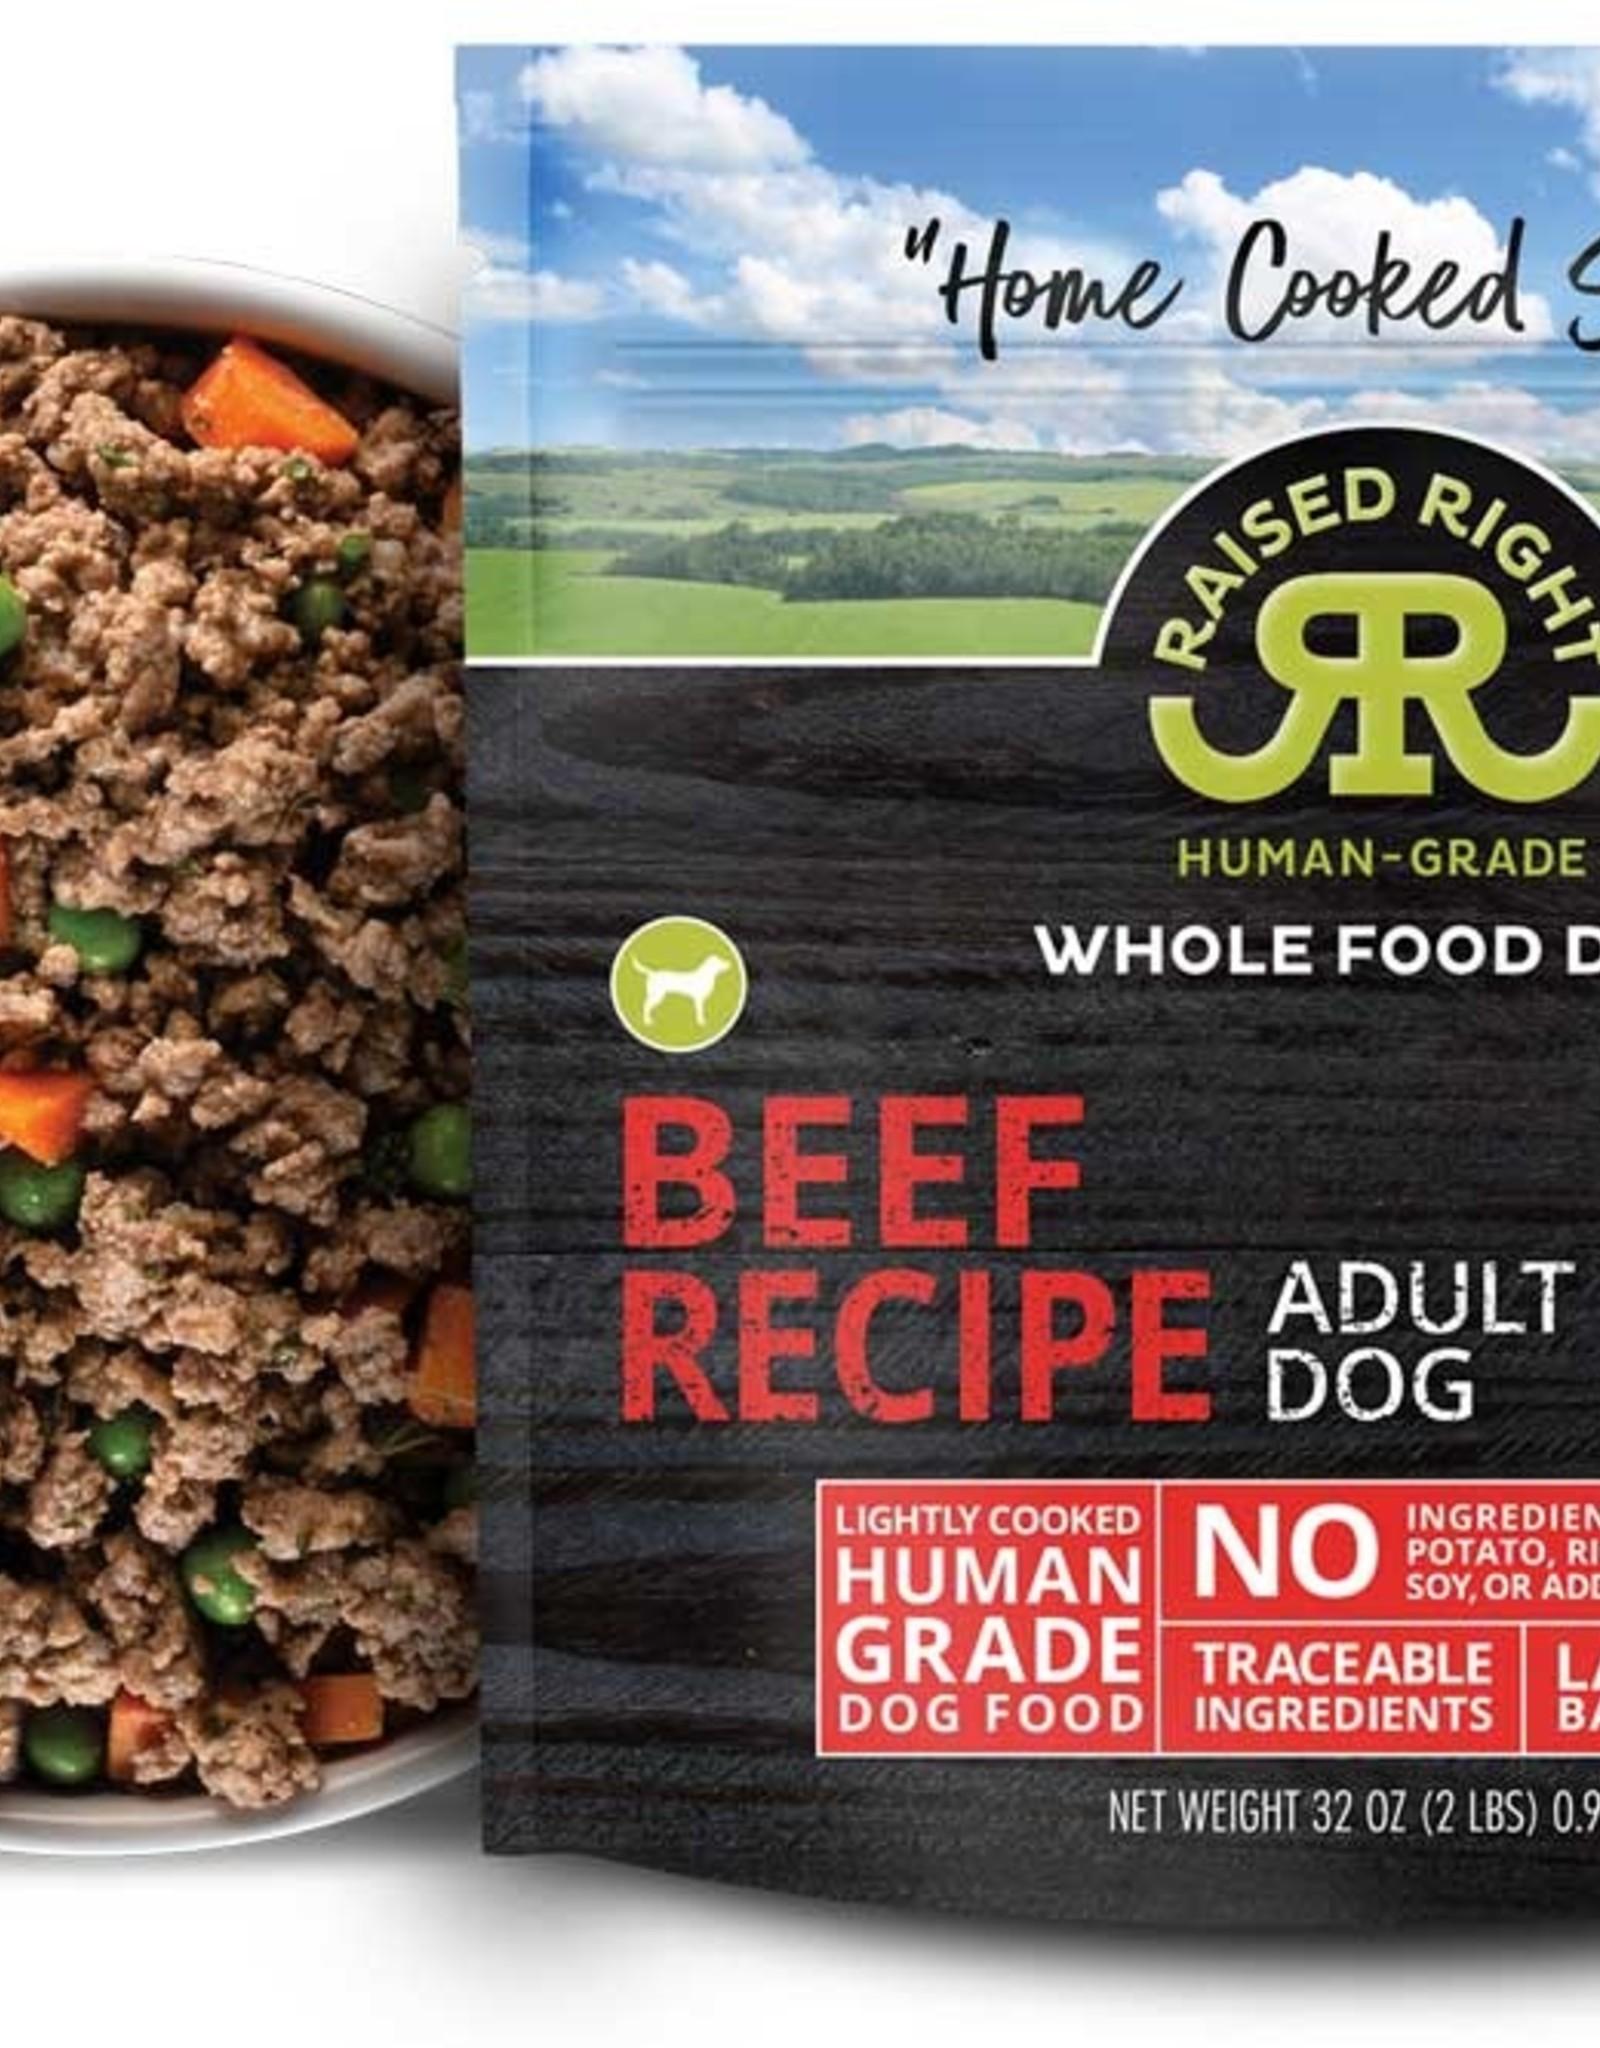 Raised Right Raised Right Beef Adult Dog Recipe